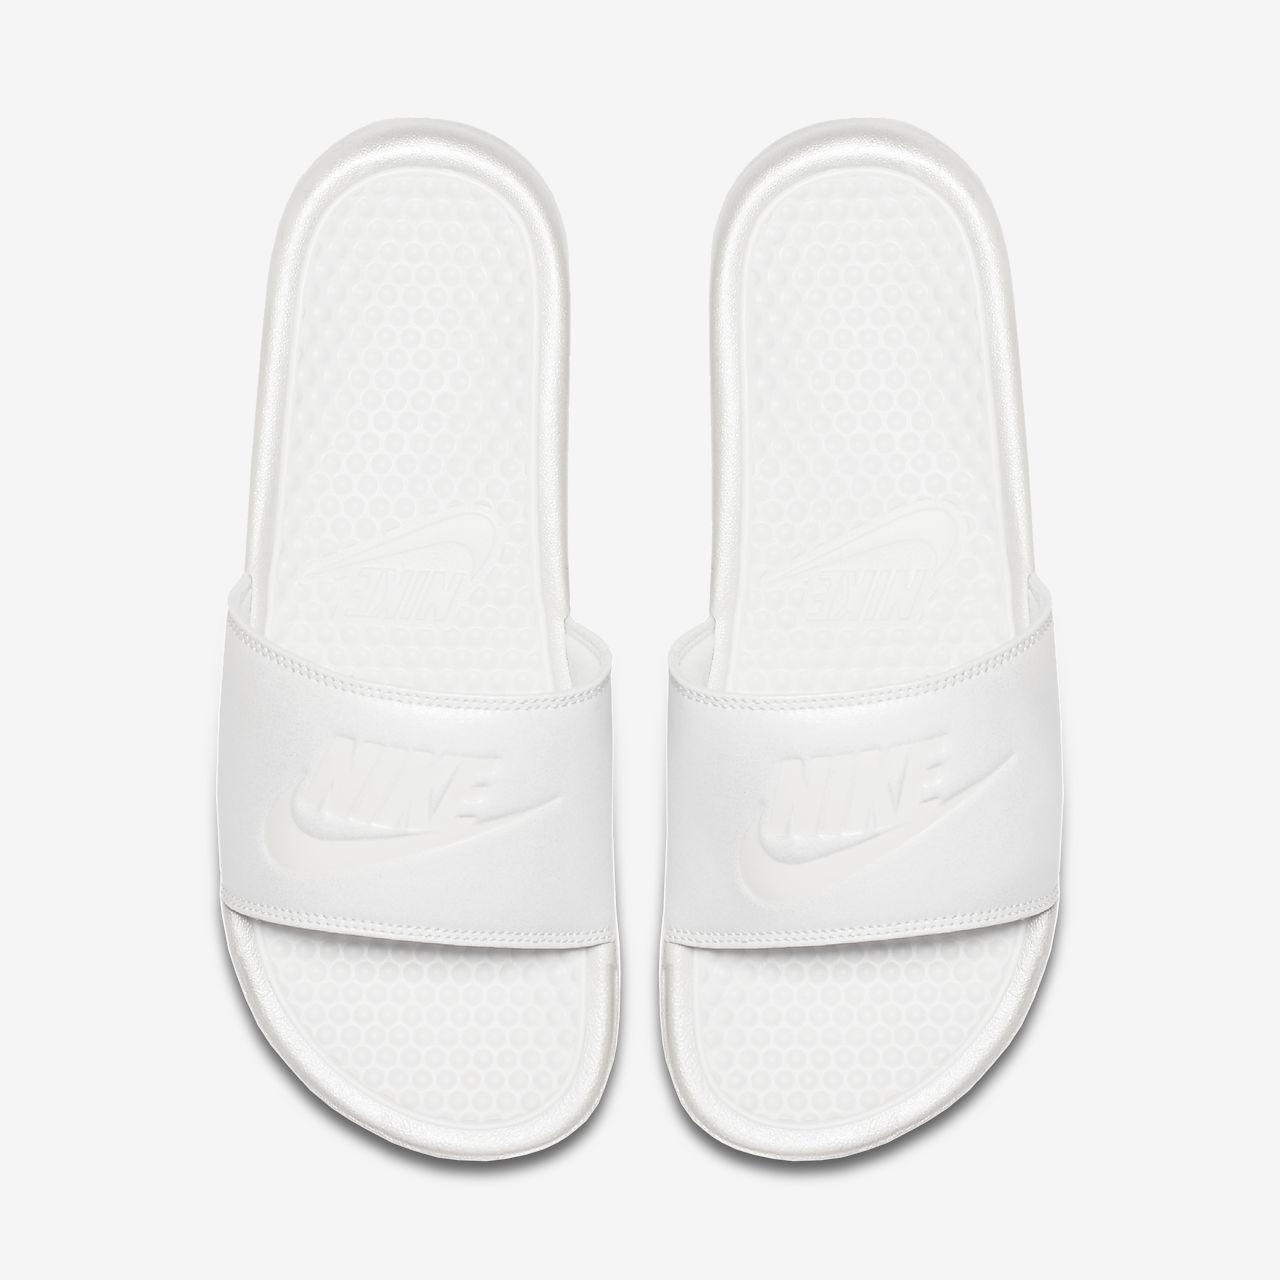 huge discount cd0fd c7184 ... Claquette Nike Benassi Metallic QS pour Femme